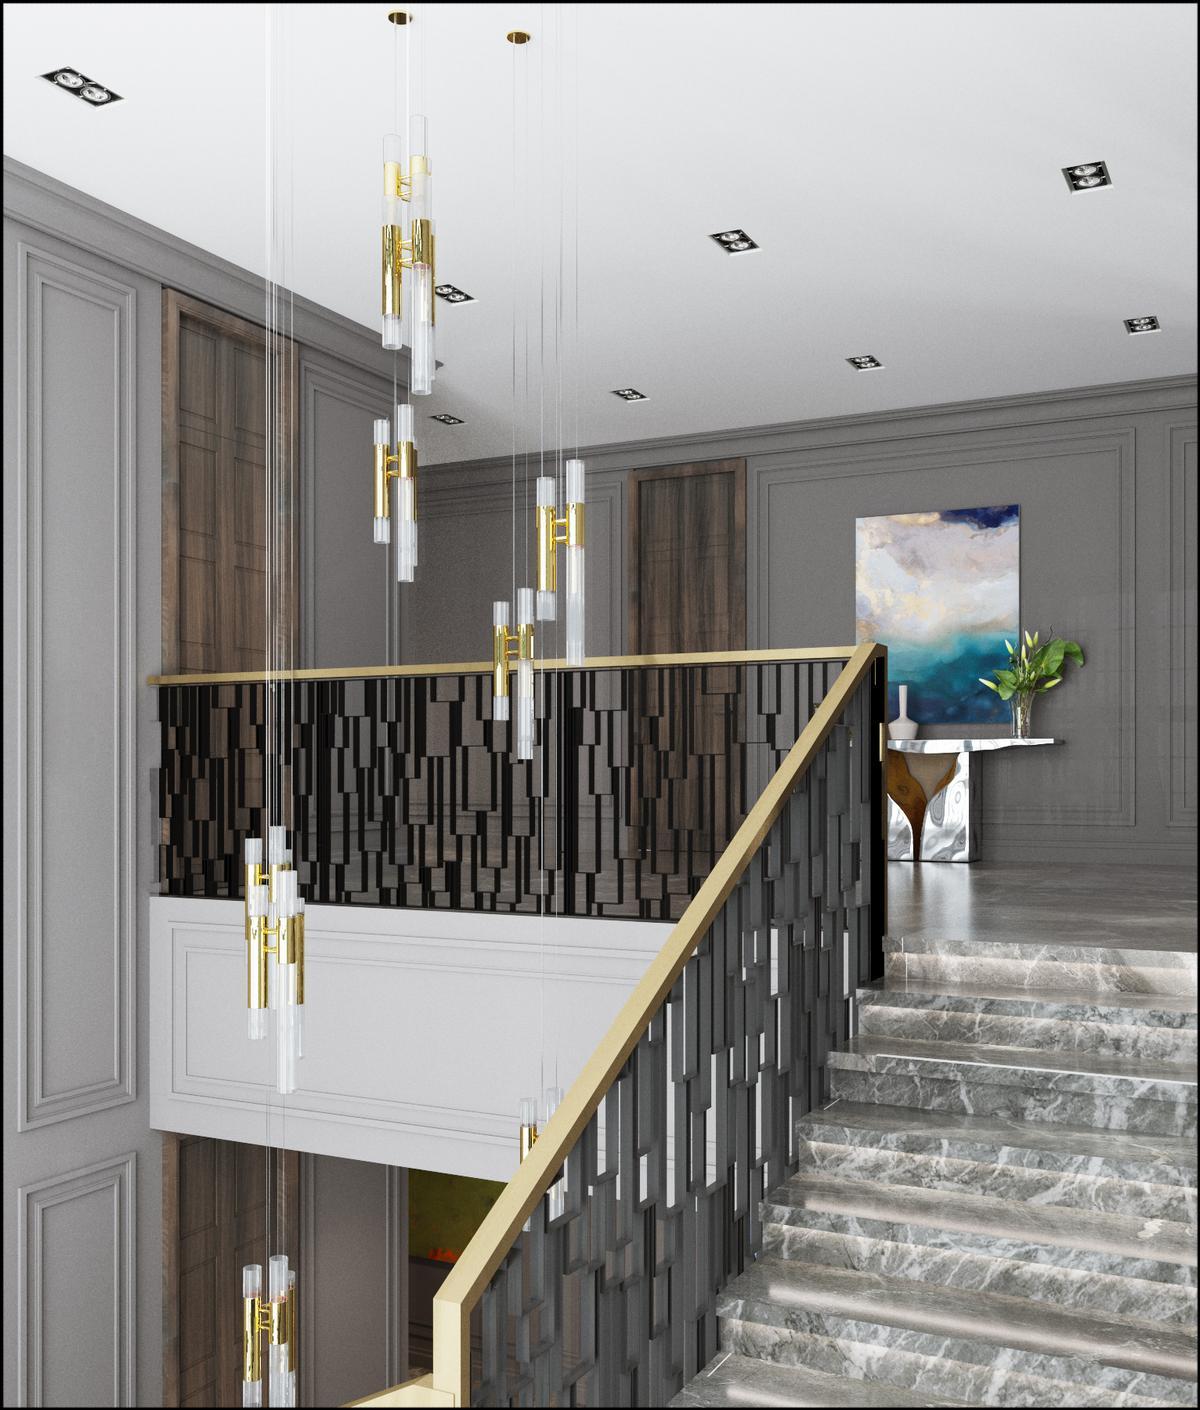 Новый проект Yunakov Architecture & Design yunakovdesign 5